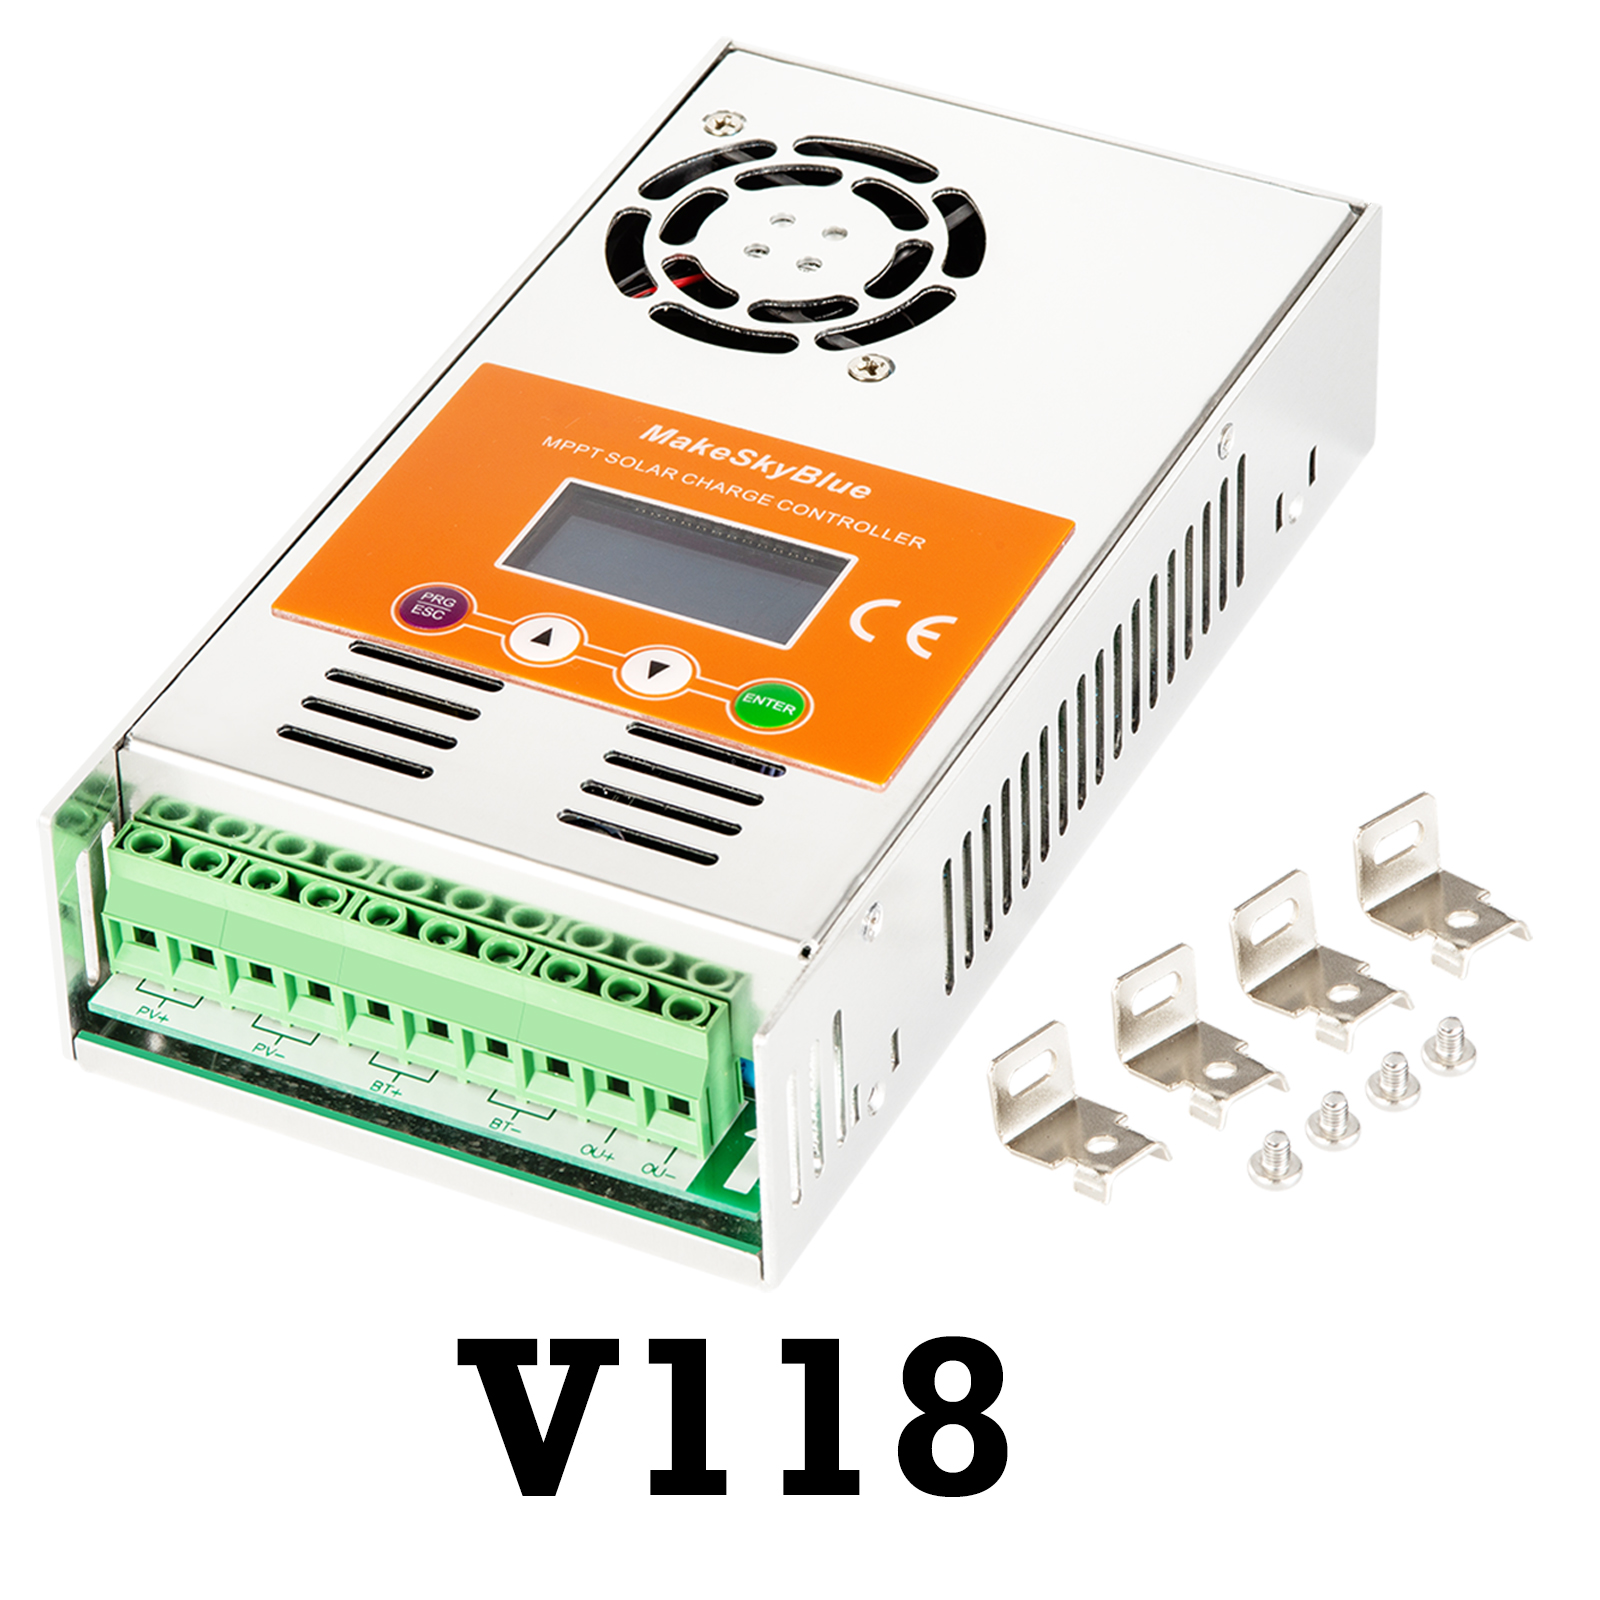 MPPT Controlador de Carga Solar V118 MakeSkyBlue 30A 40A 45A 50A 60A para 12V 72 48 24V V V 96V Carregador de Bateria Solar Regulador De Energia